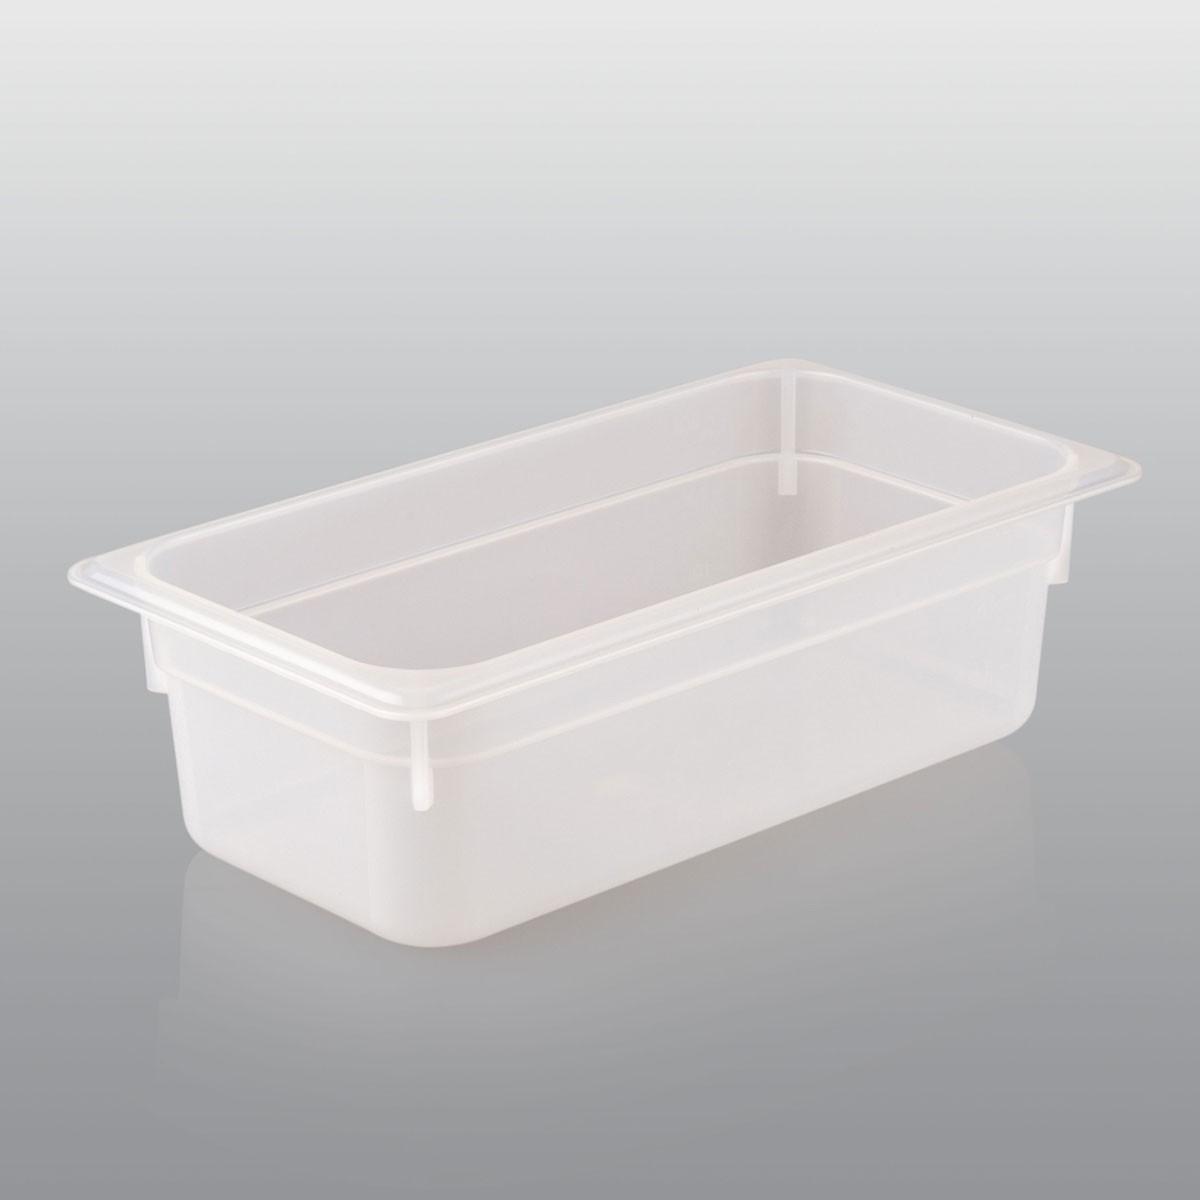 GN Behälter GN 1/3 aus Polypropylen (Tiefe: 65mm) Saro 2,5 L